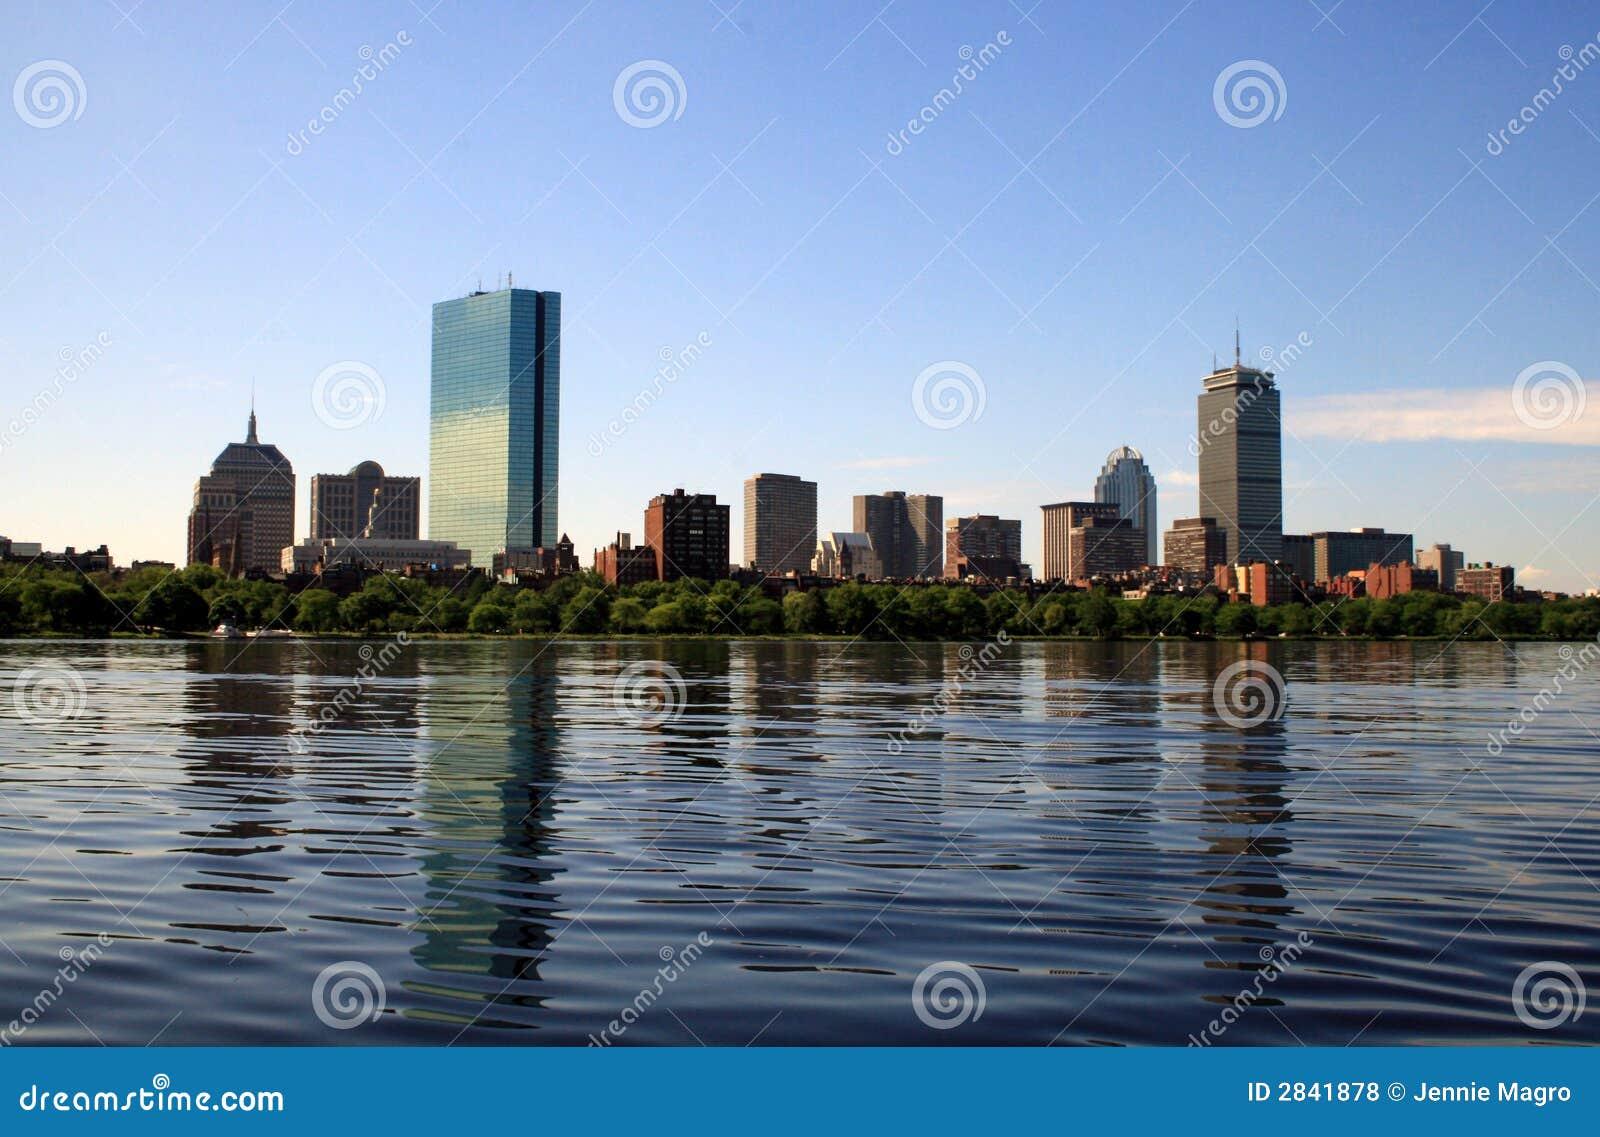 Free online dating boston